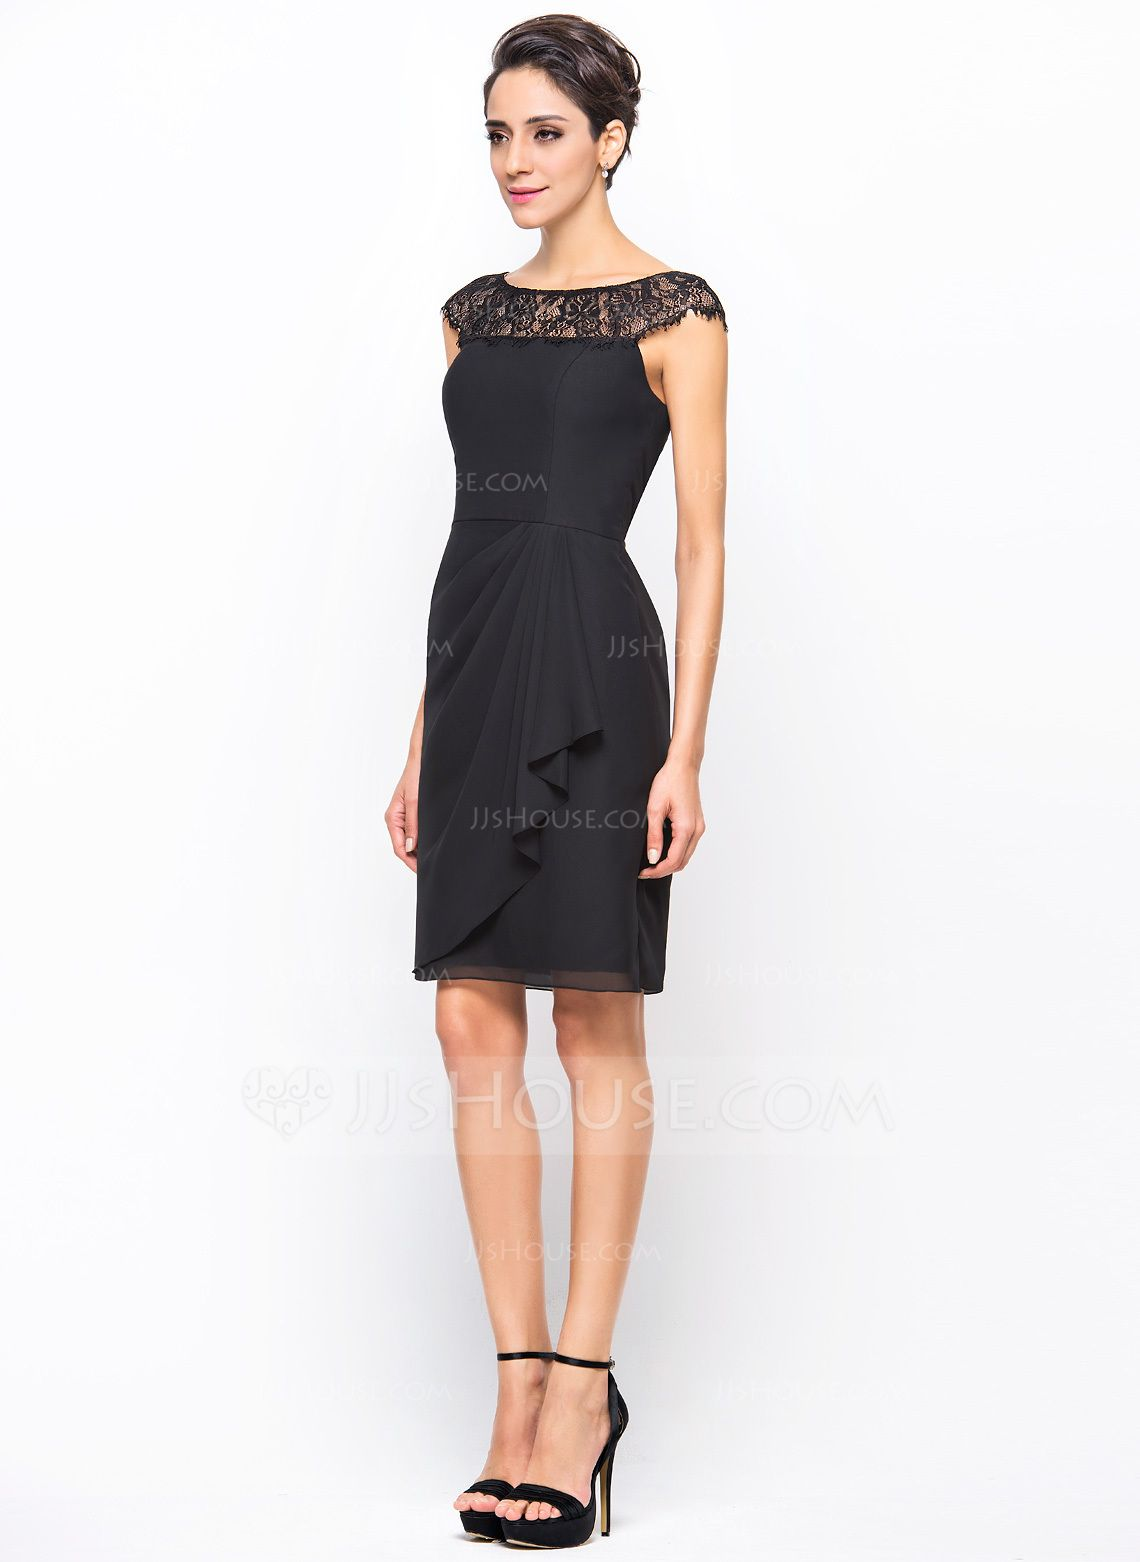 651307e96c Sheath Column Scoop Neck Knee-Length Chiffon Cocktail Dress With Lace Cascading  Ruffles (016055956)